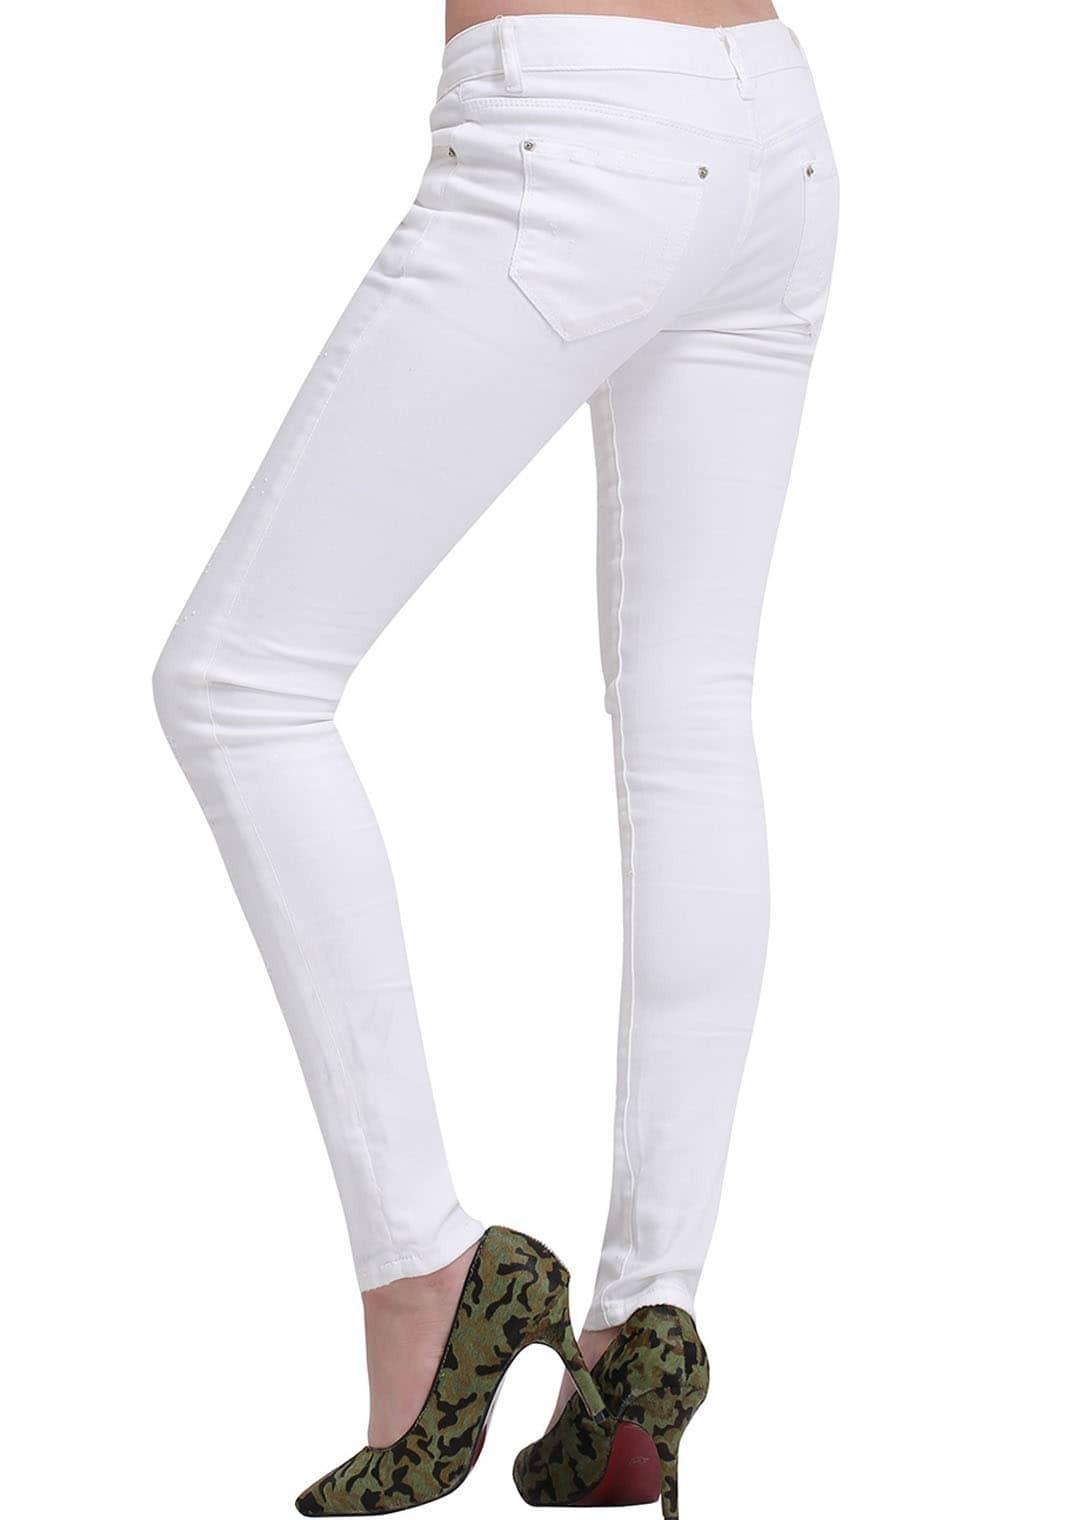 pantalon en denim d chir blanc french shein sheinside. Black Bedroom Furniture Sets. Home Design Ideas